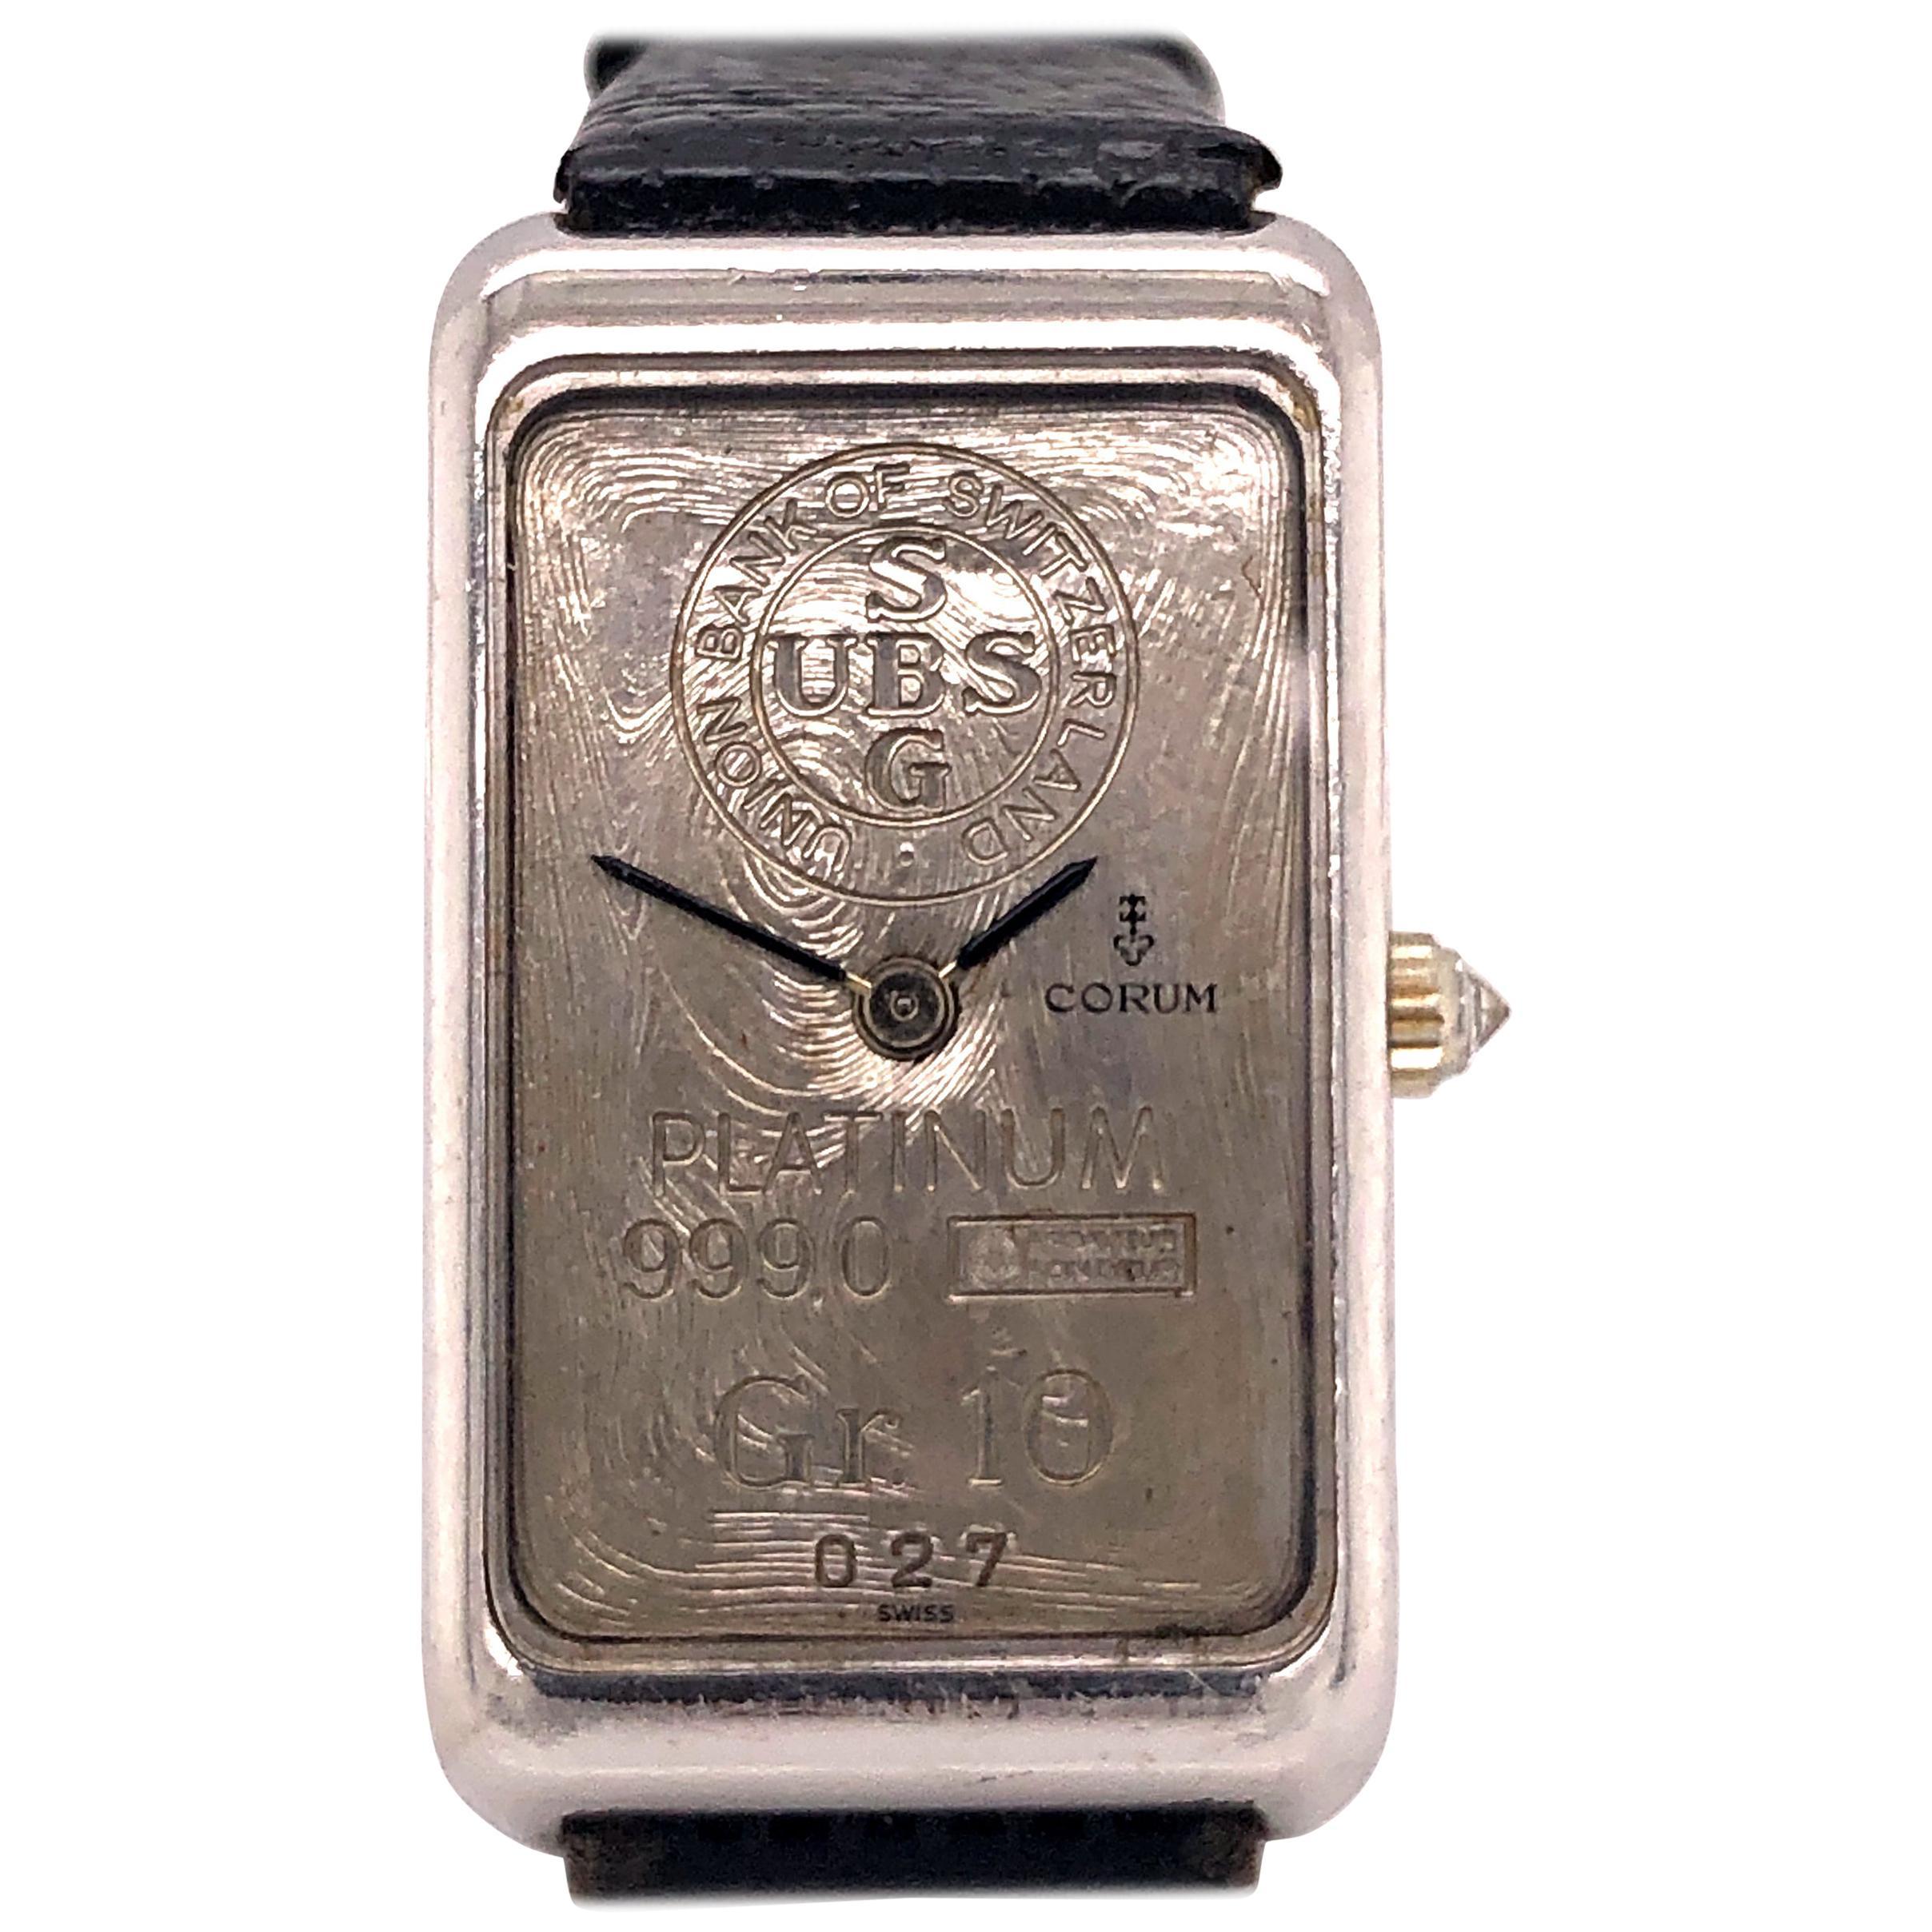 Corum Platinum and Diamond Watch 10 Gram UBS Ingot Bar Rare